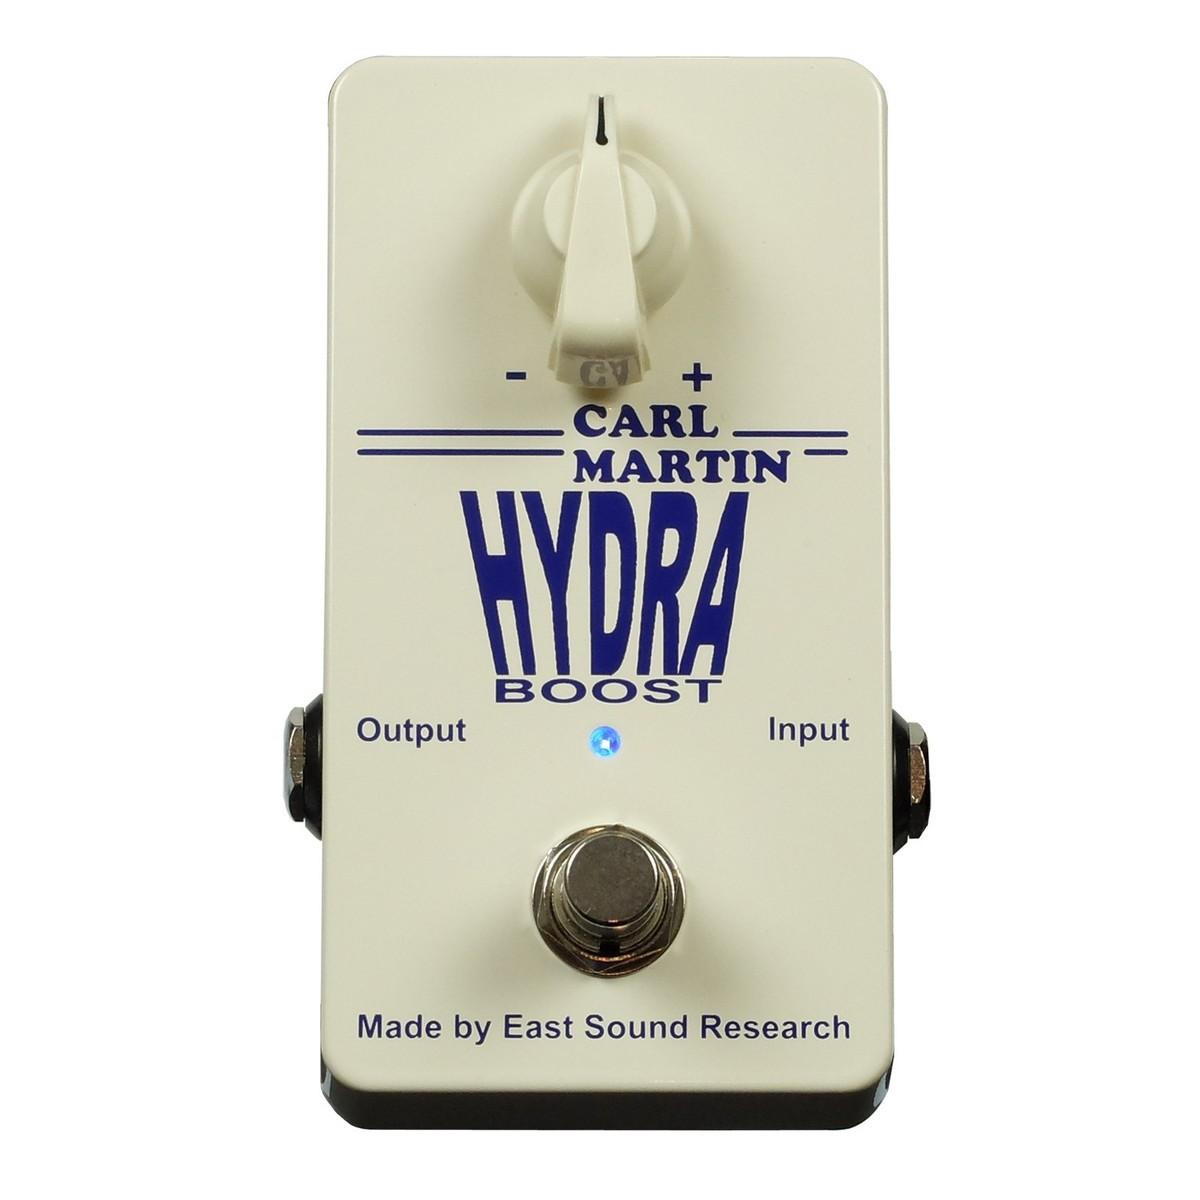 Carl martin hydra boost at gear4music carl martin hydra boost sciox Gallery